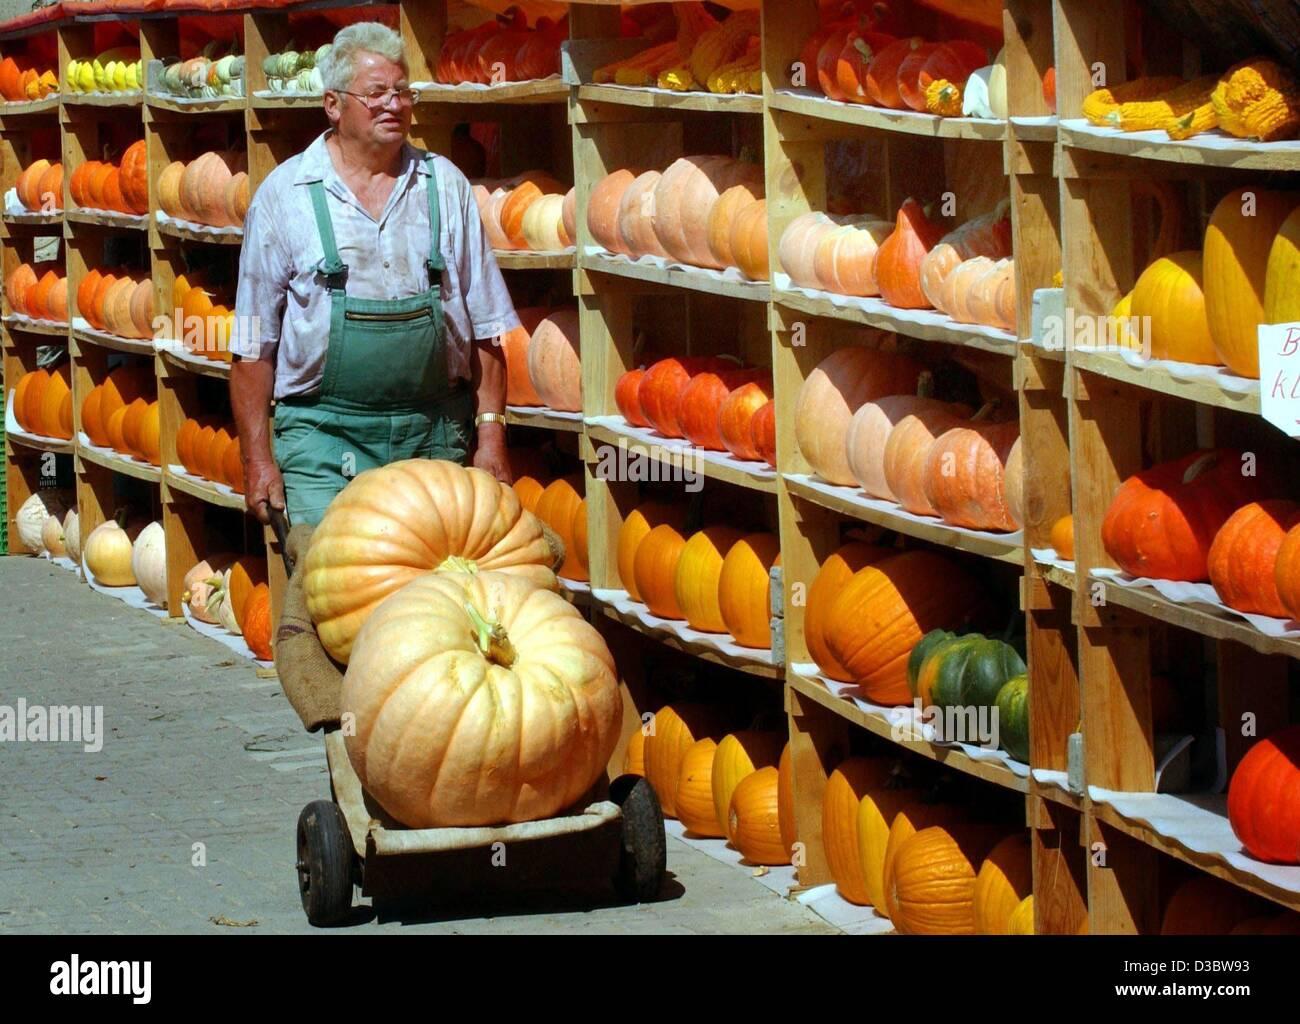 (dpa) - Farmer Eberhard Riecke pushes two huge pumpkins on a wheelbarrow past a shelf of smaller pumpkins in Philipstal, - Stock Image